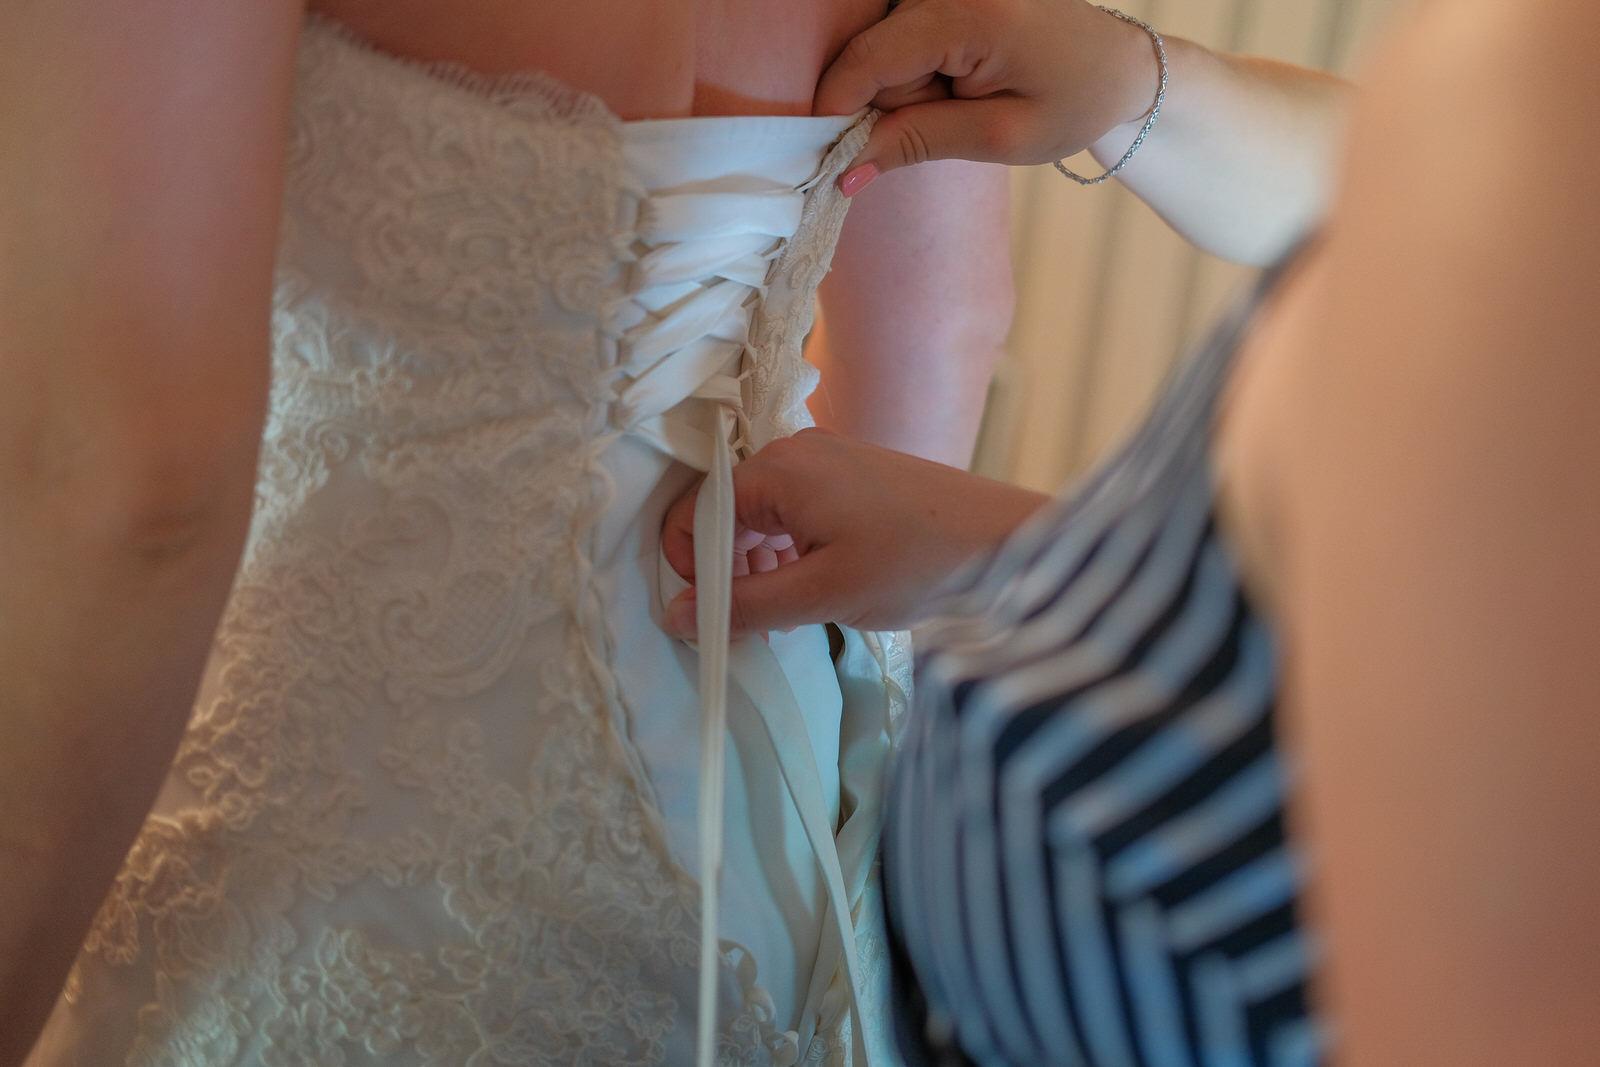 candid-vermont-wedding-photography-179.jpg